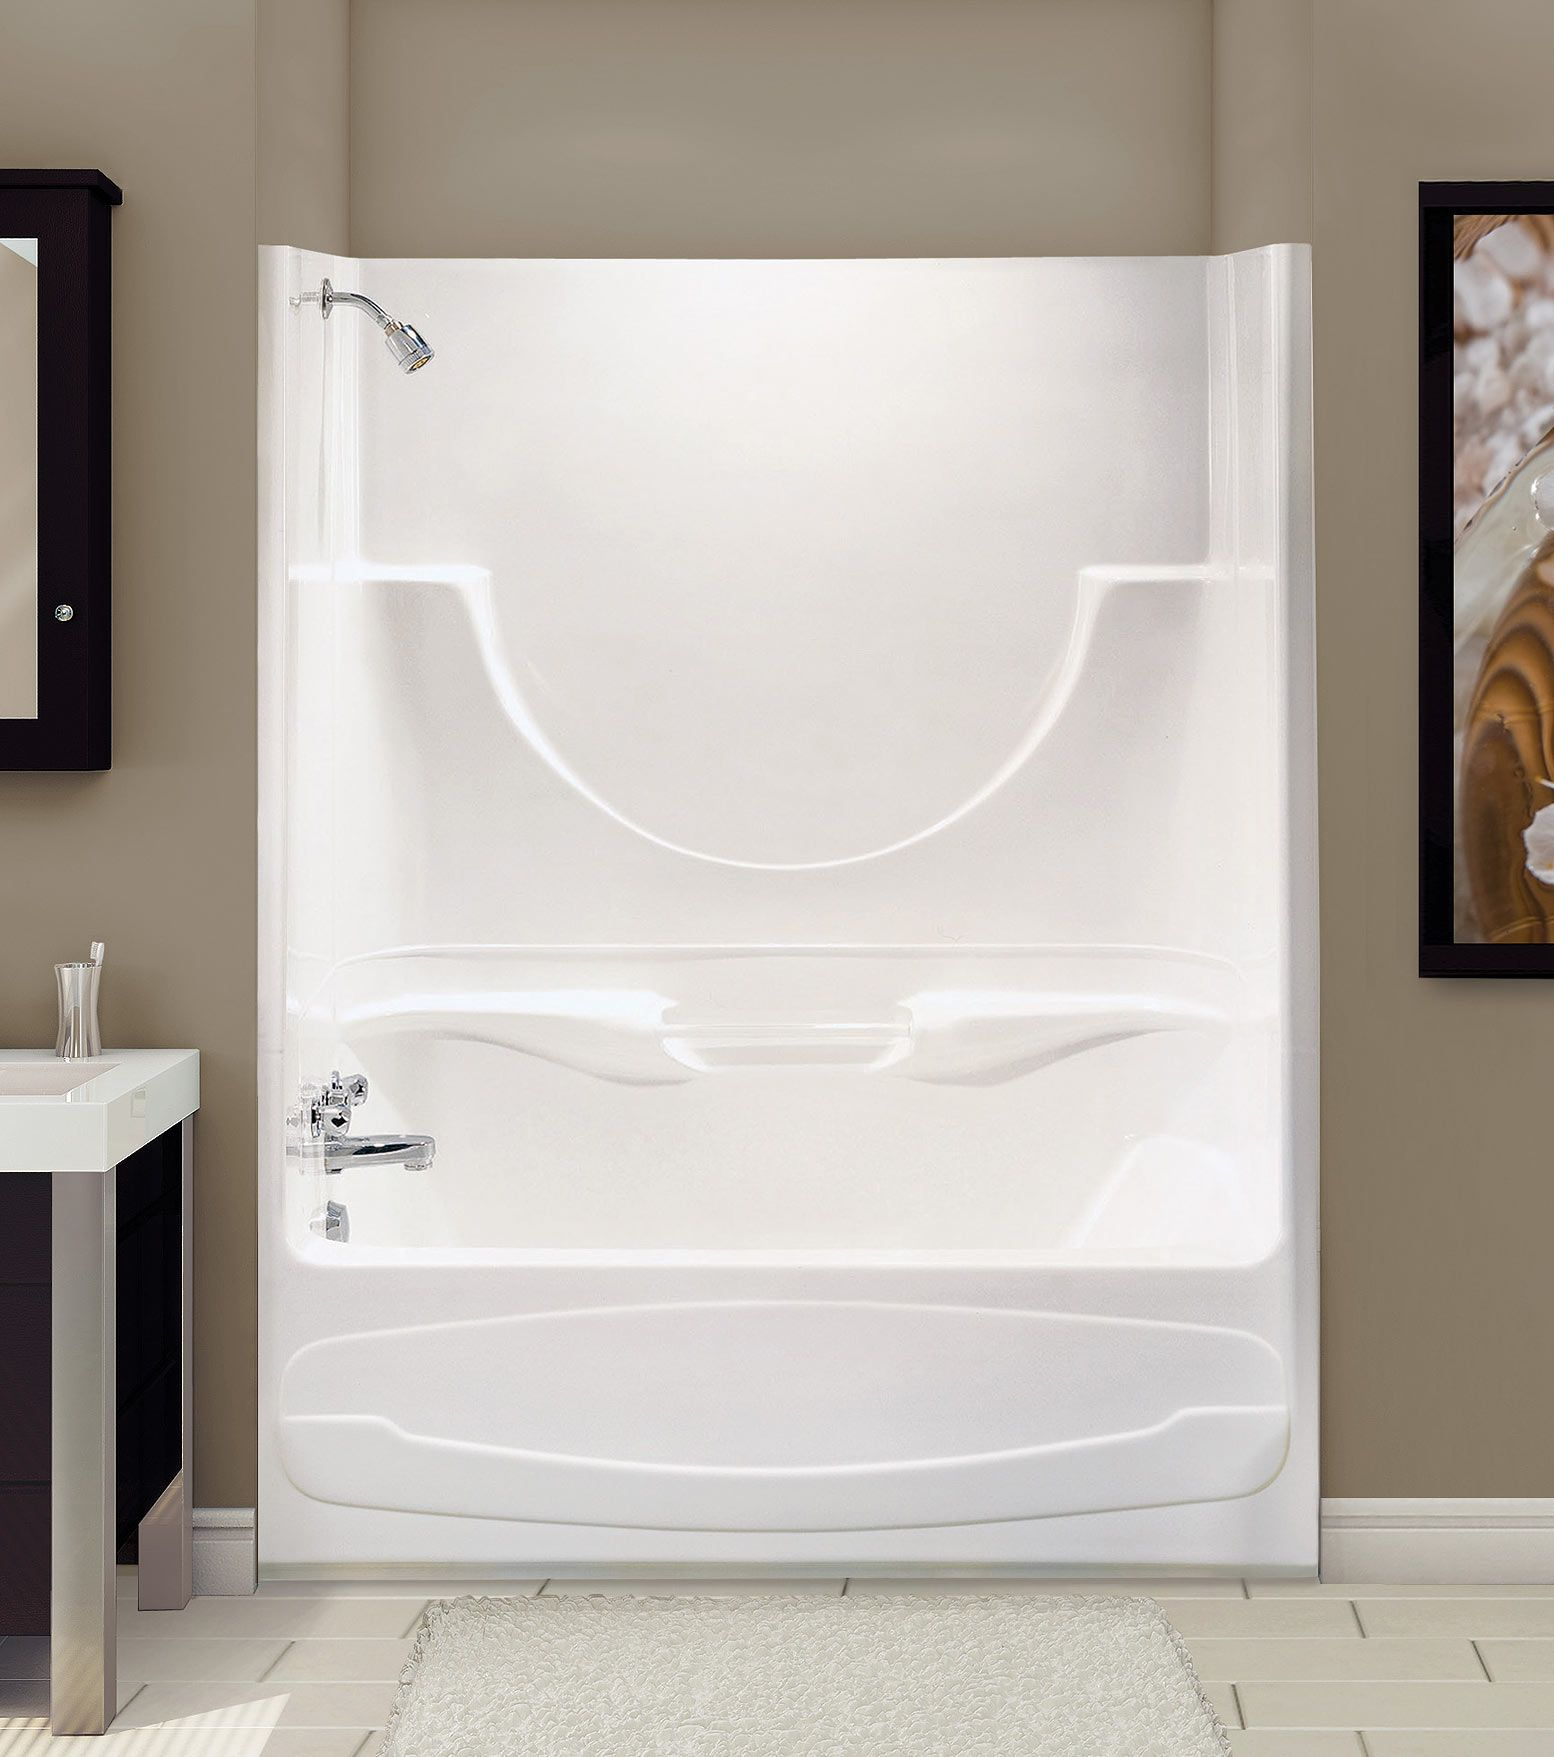 two piece shower tub unit. CONCERTO II Alcove Or Tub Showers Bathtub  MAAX Professional One Piece ShowerTub For